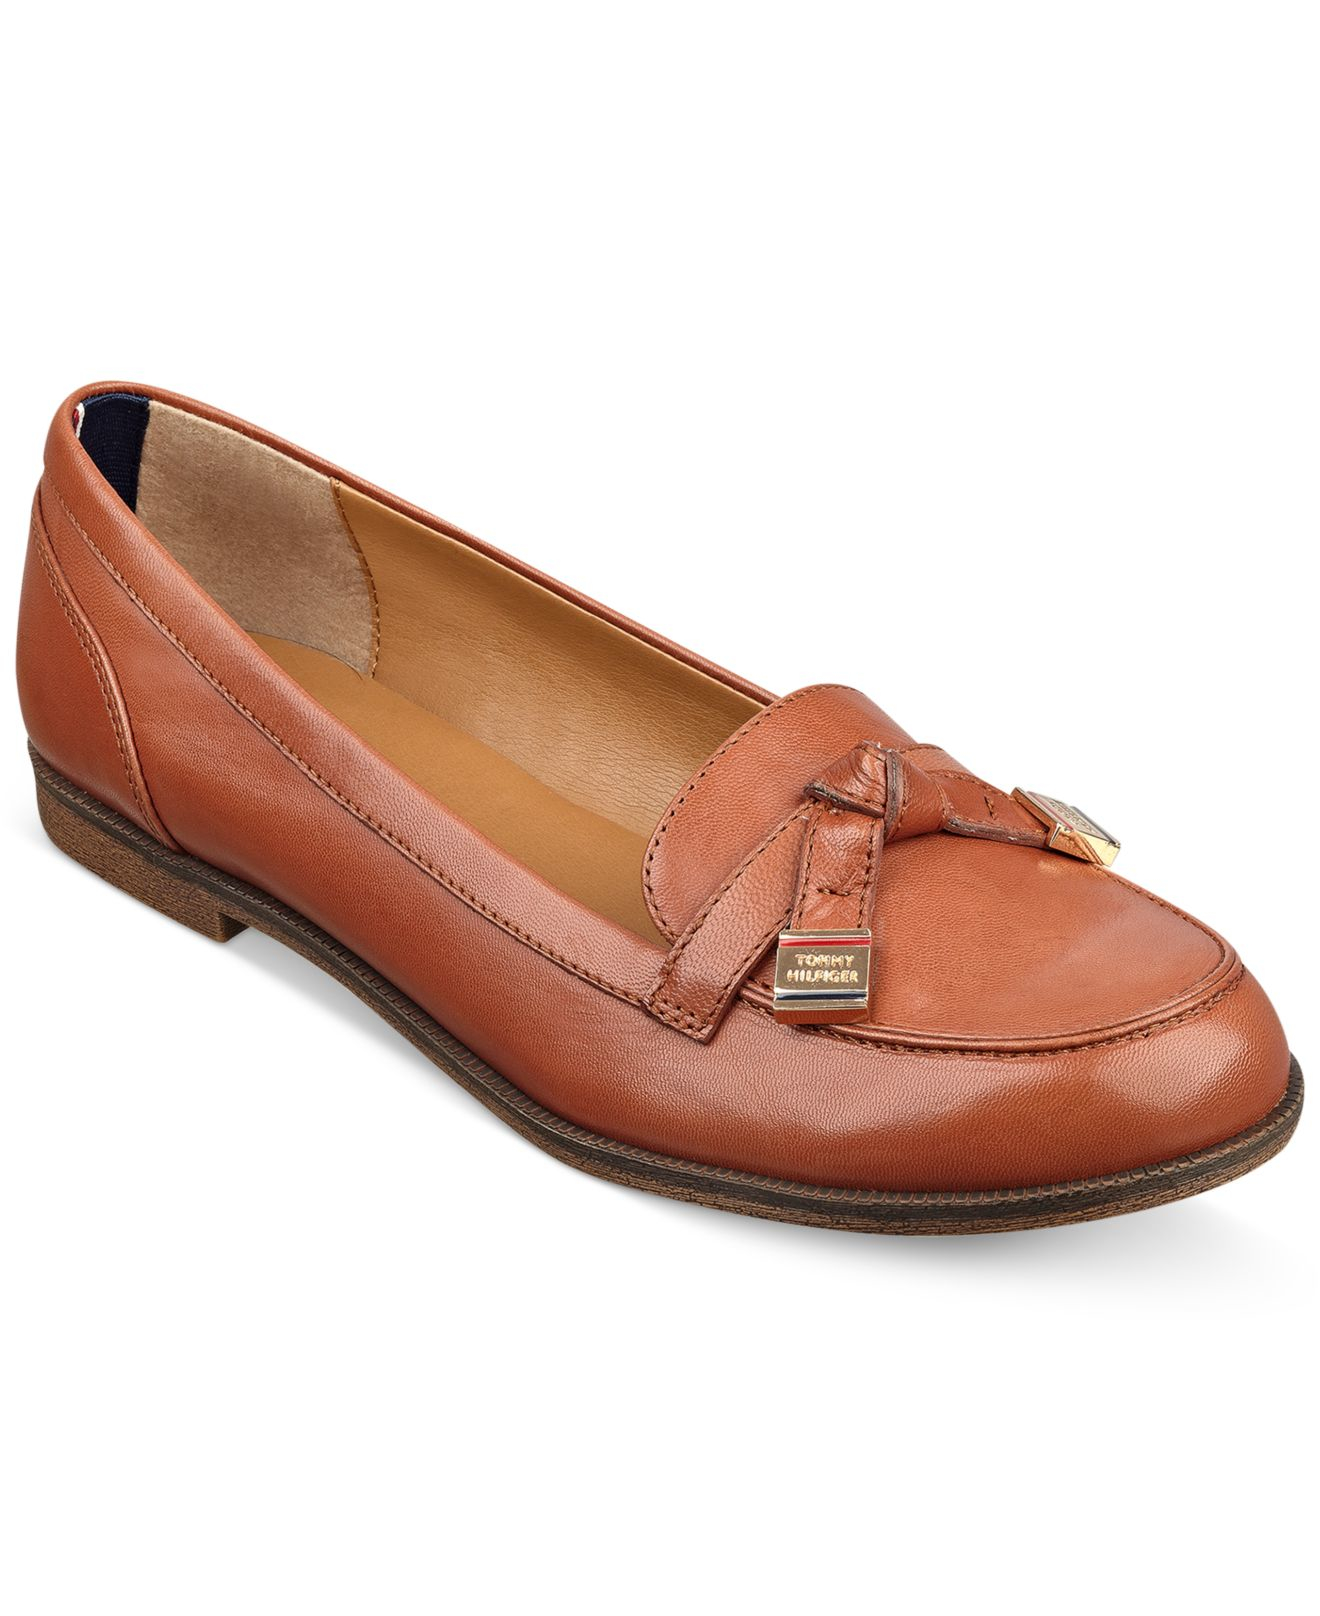 Womens Flats Tommy Hilfiger Letyan Flats Womens Shoes Flats Discount